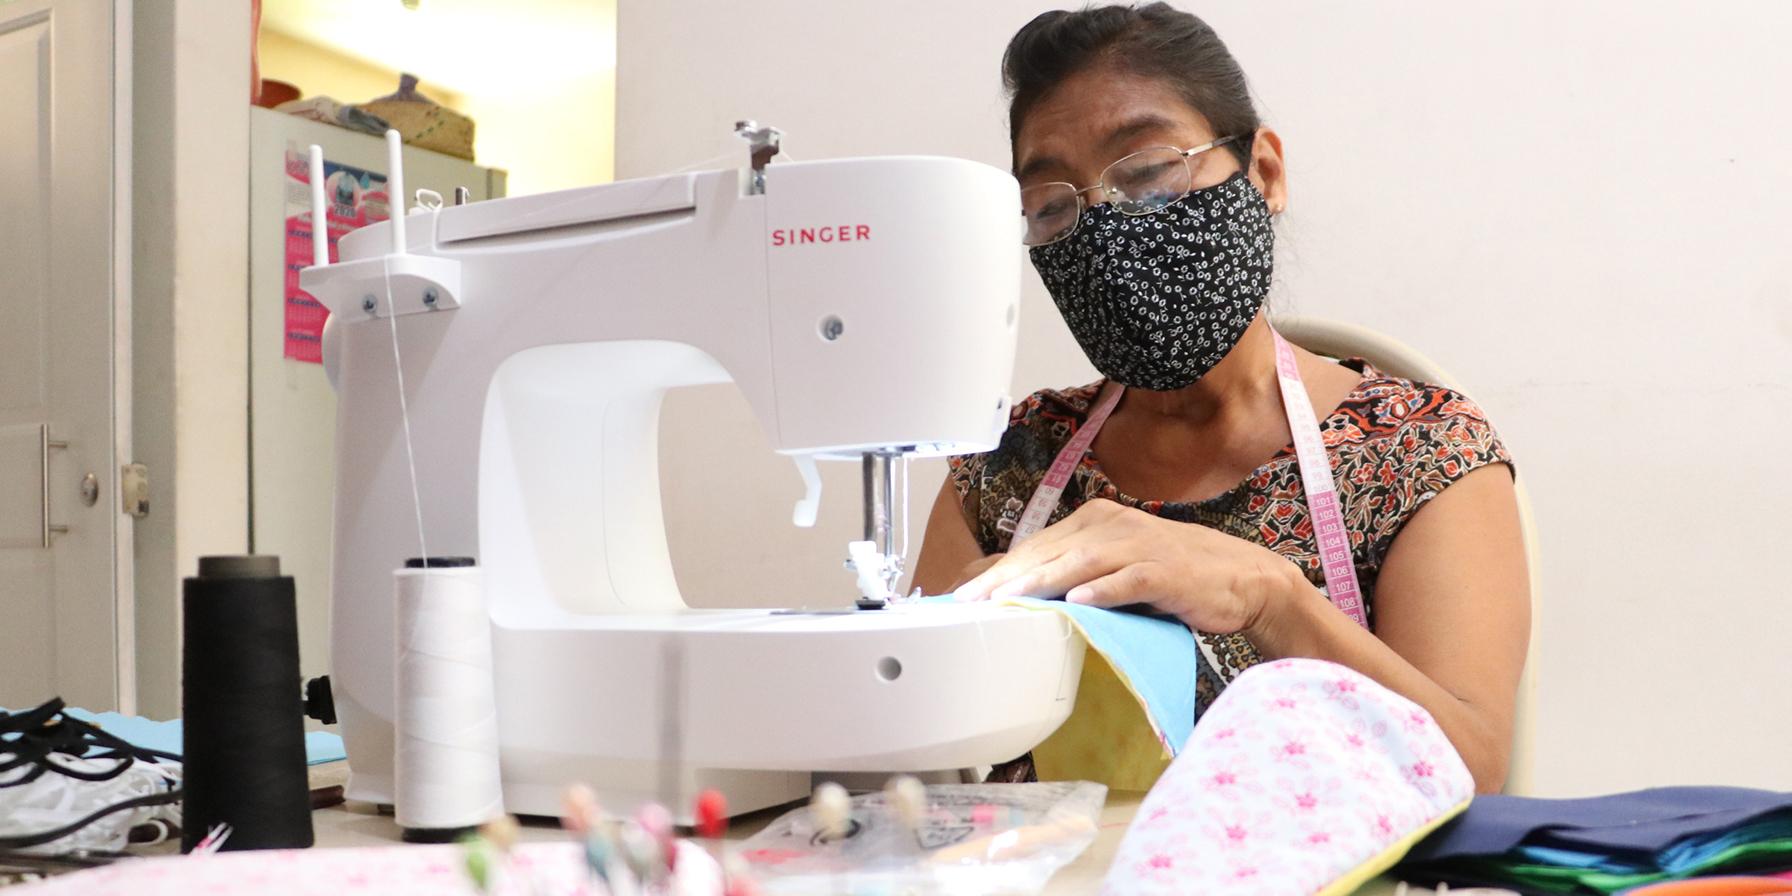 El desempleo lleva a Virginia a emprender   El Imparcial de Oaxaca